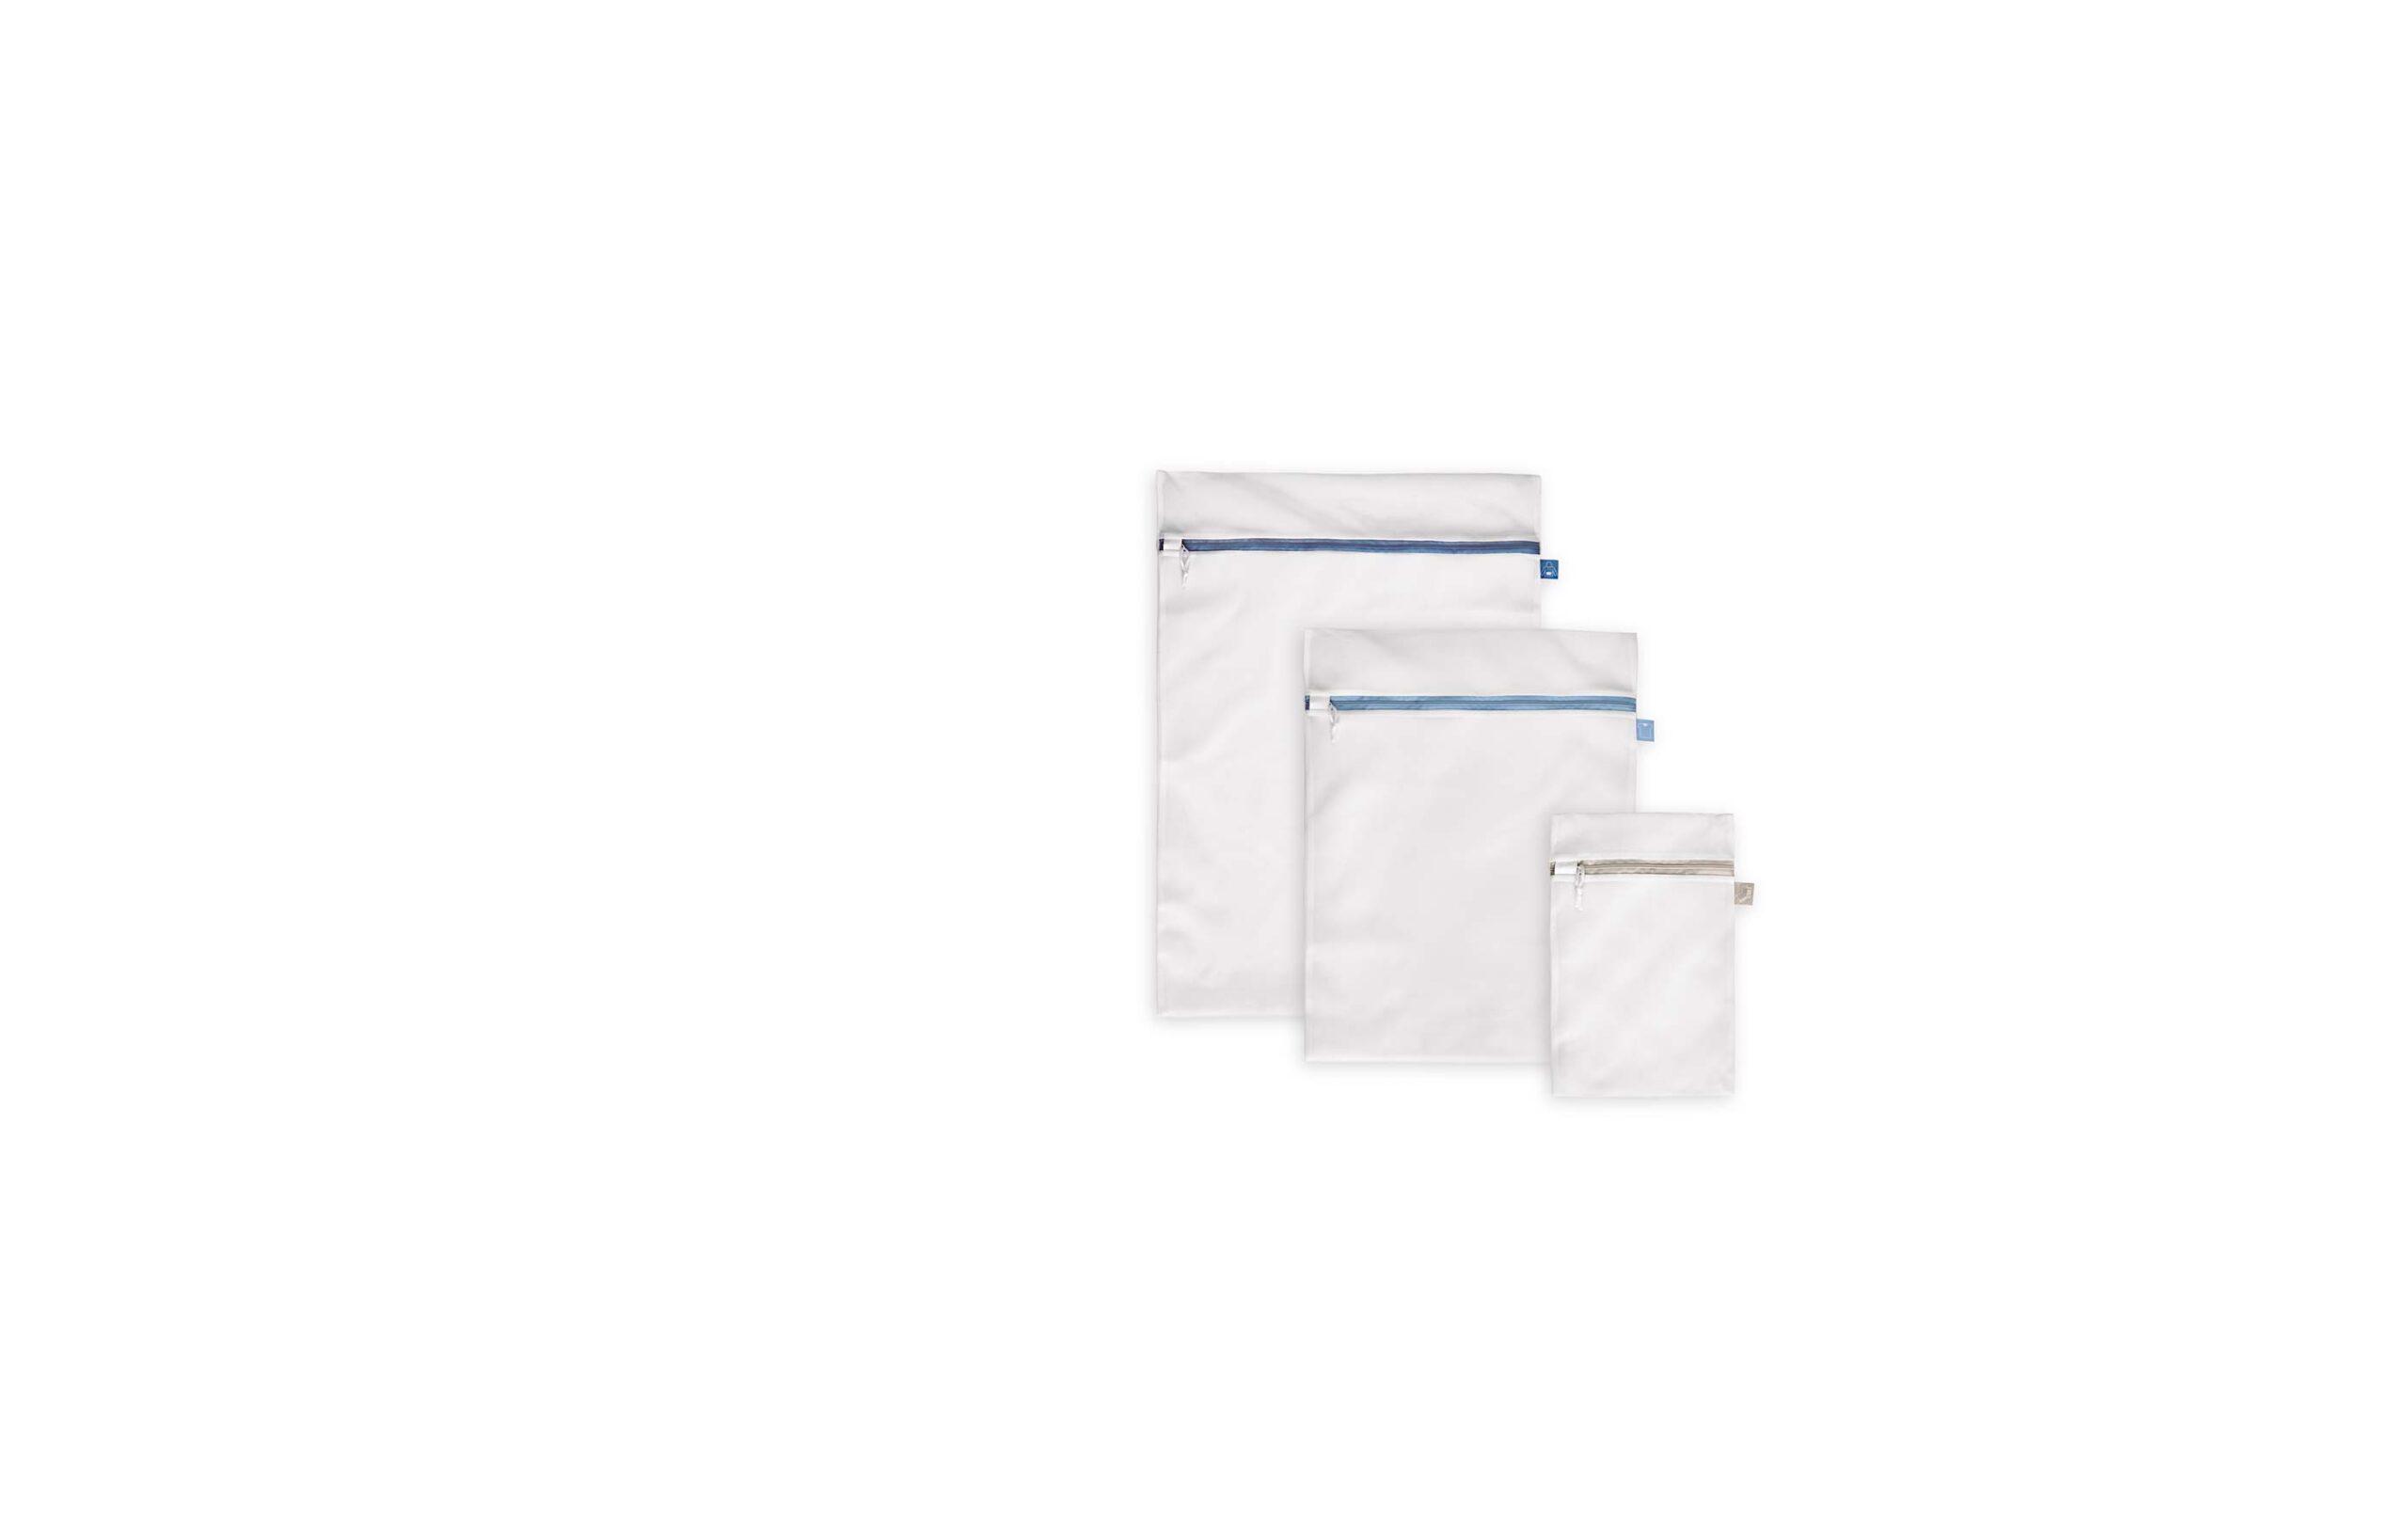 bolsa-lavadora-1-scaled bolsa-lavadora-1 | Rayen.com